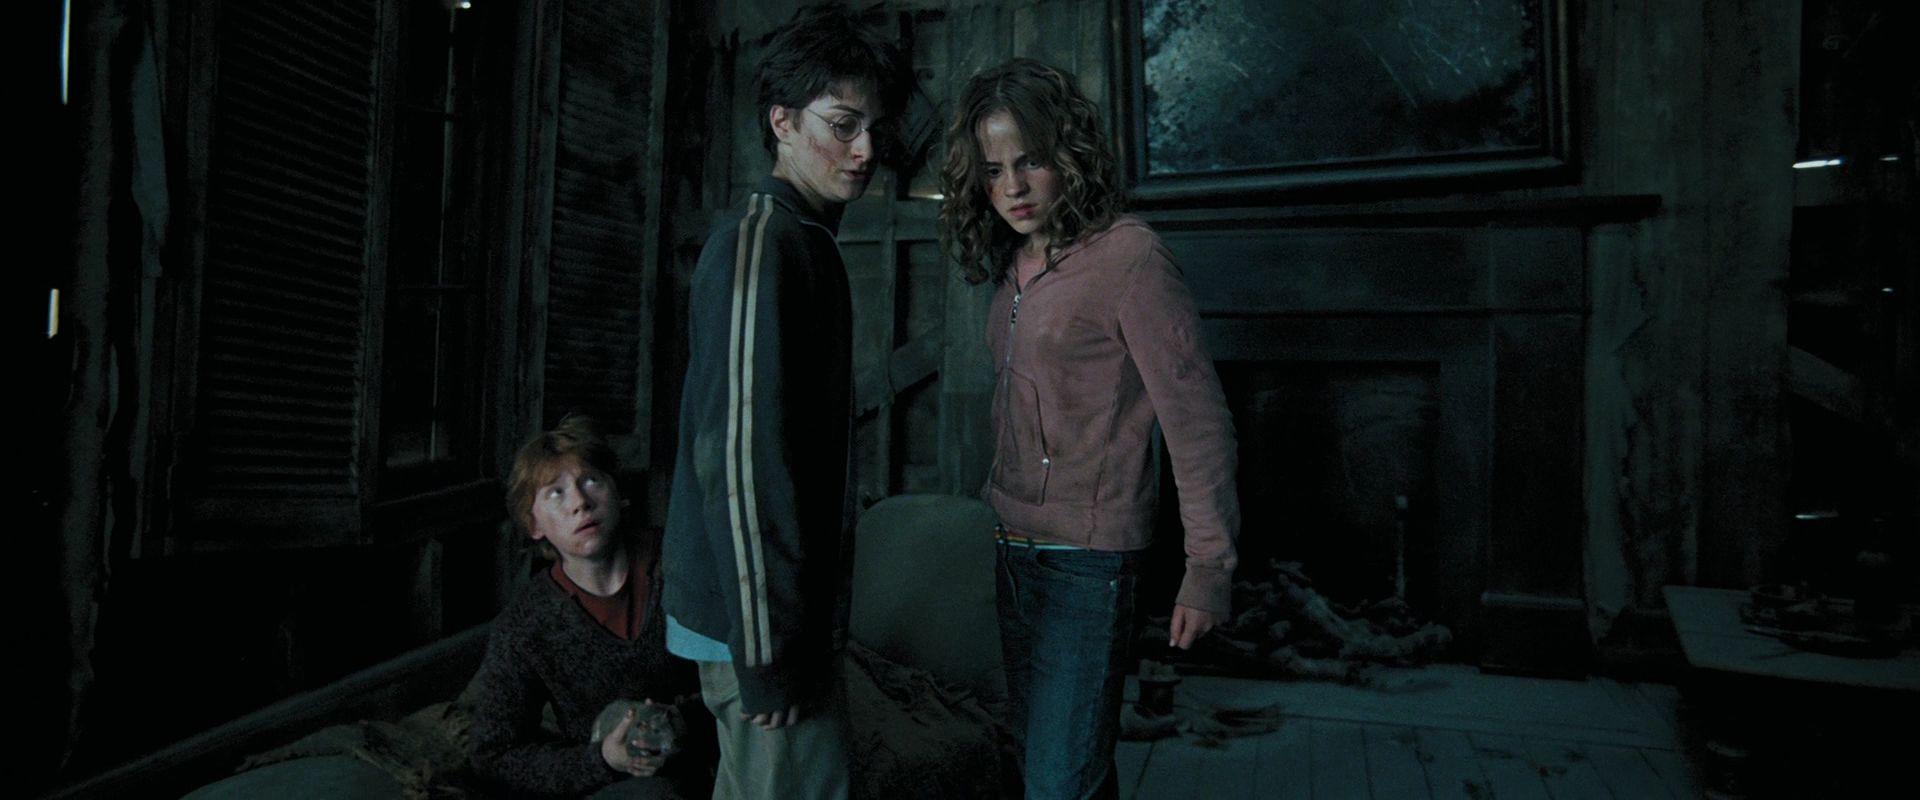 Emma Watson Hermione Granger Azkaban hermione granger  : Emma as Hermione Granger In Harry Potter and The Prisoner Of Azkaban emma watson 23972800 1920 800 from hairstylegalleries.com size 1920 x 800 jpeg 126kB